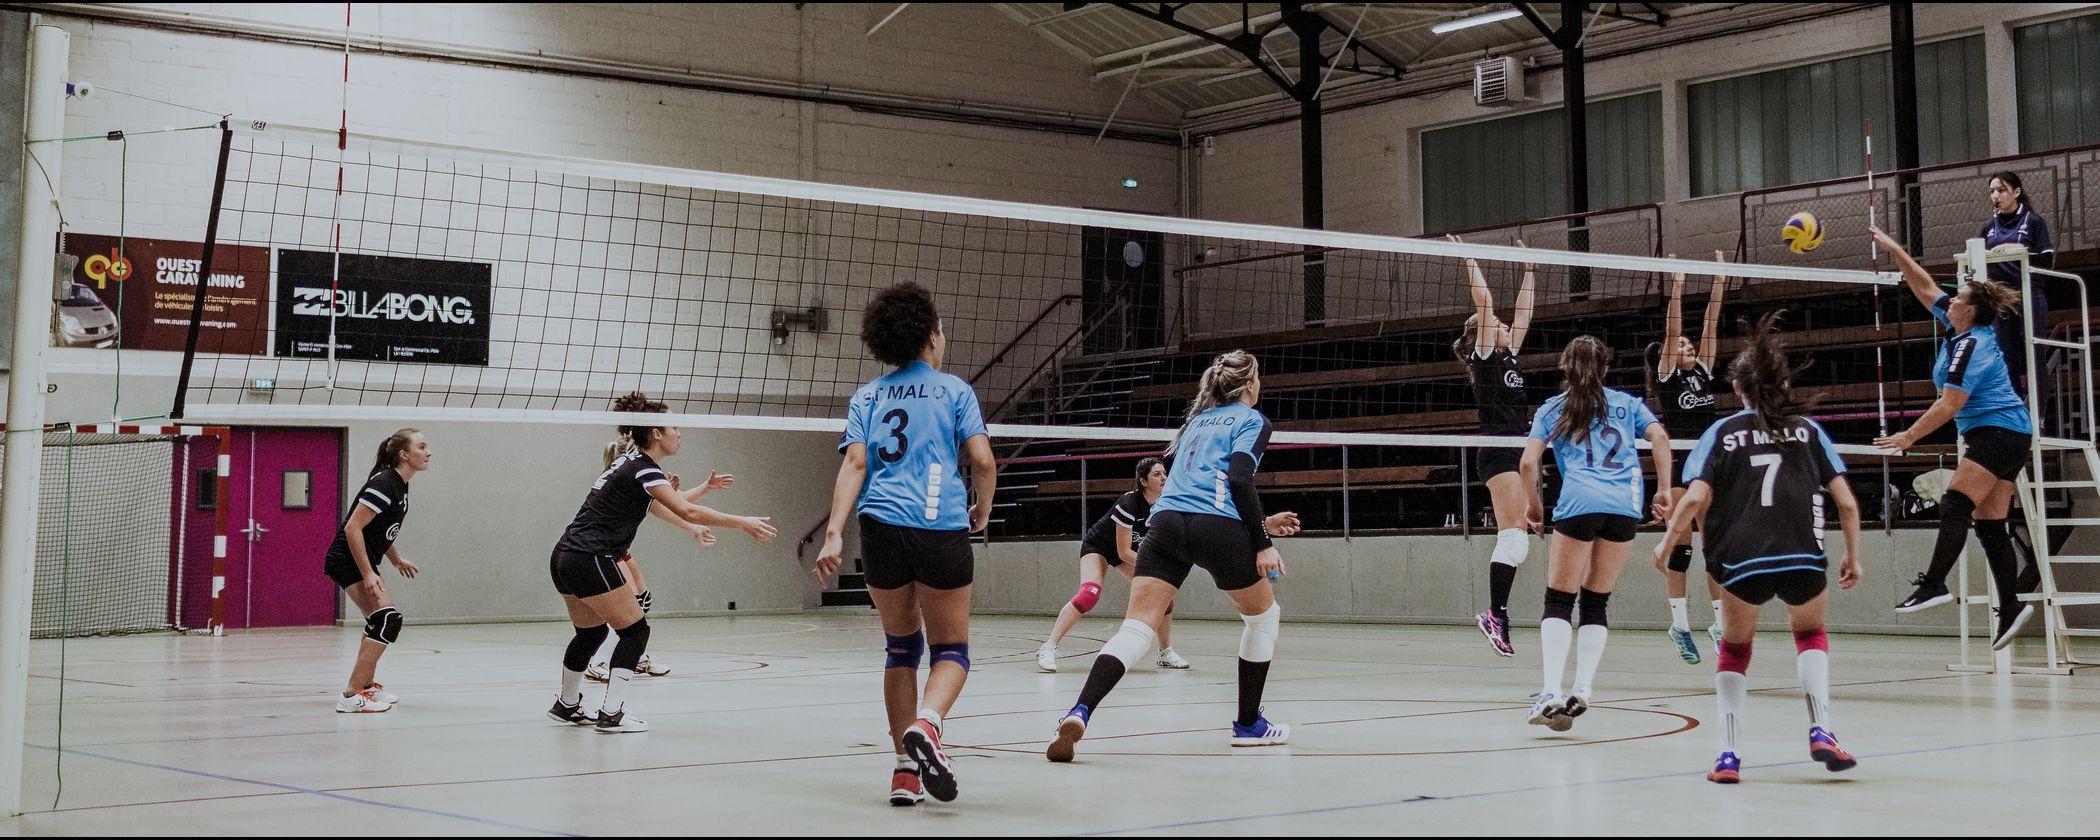 volley ball club saint-malo